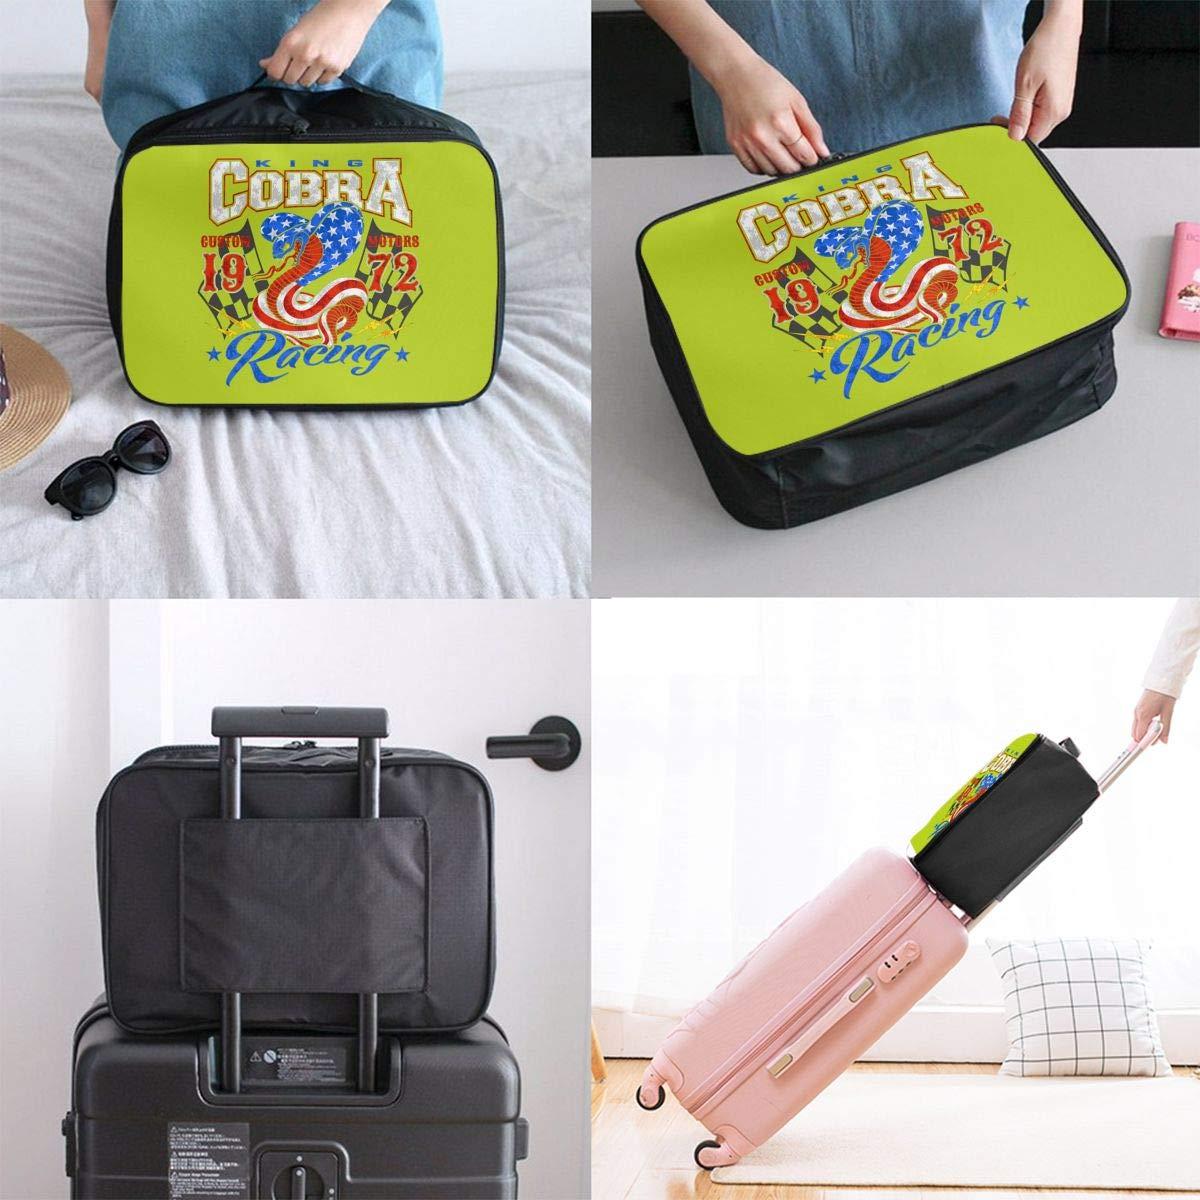 Travel Duffel Bag Waterproof Lightweight Large Capacity Duffel Tote Bag King Cobra Motor Racing Graphic Portable Weekender Bag For Travel Camping Sport